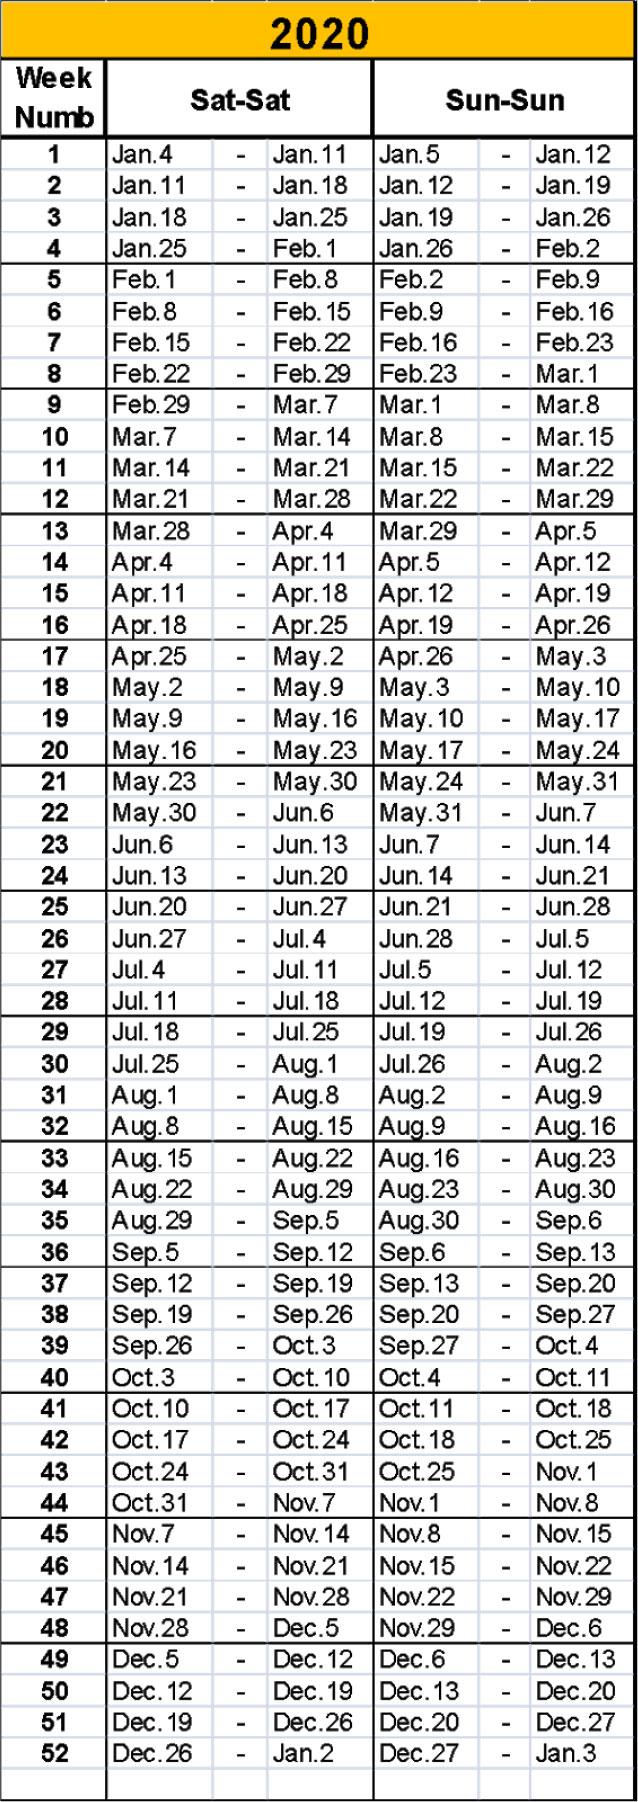 Royal Islander Club St Maarten – Timeshare Calendar